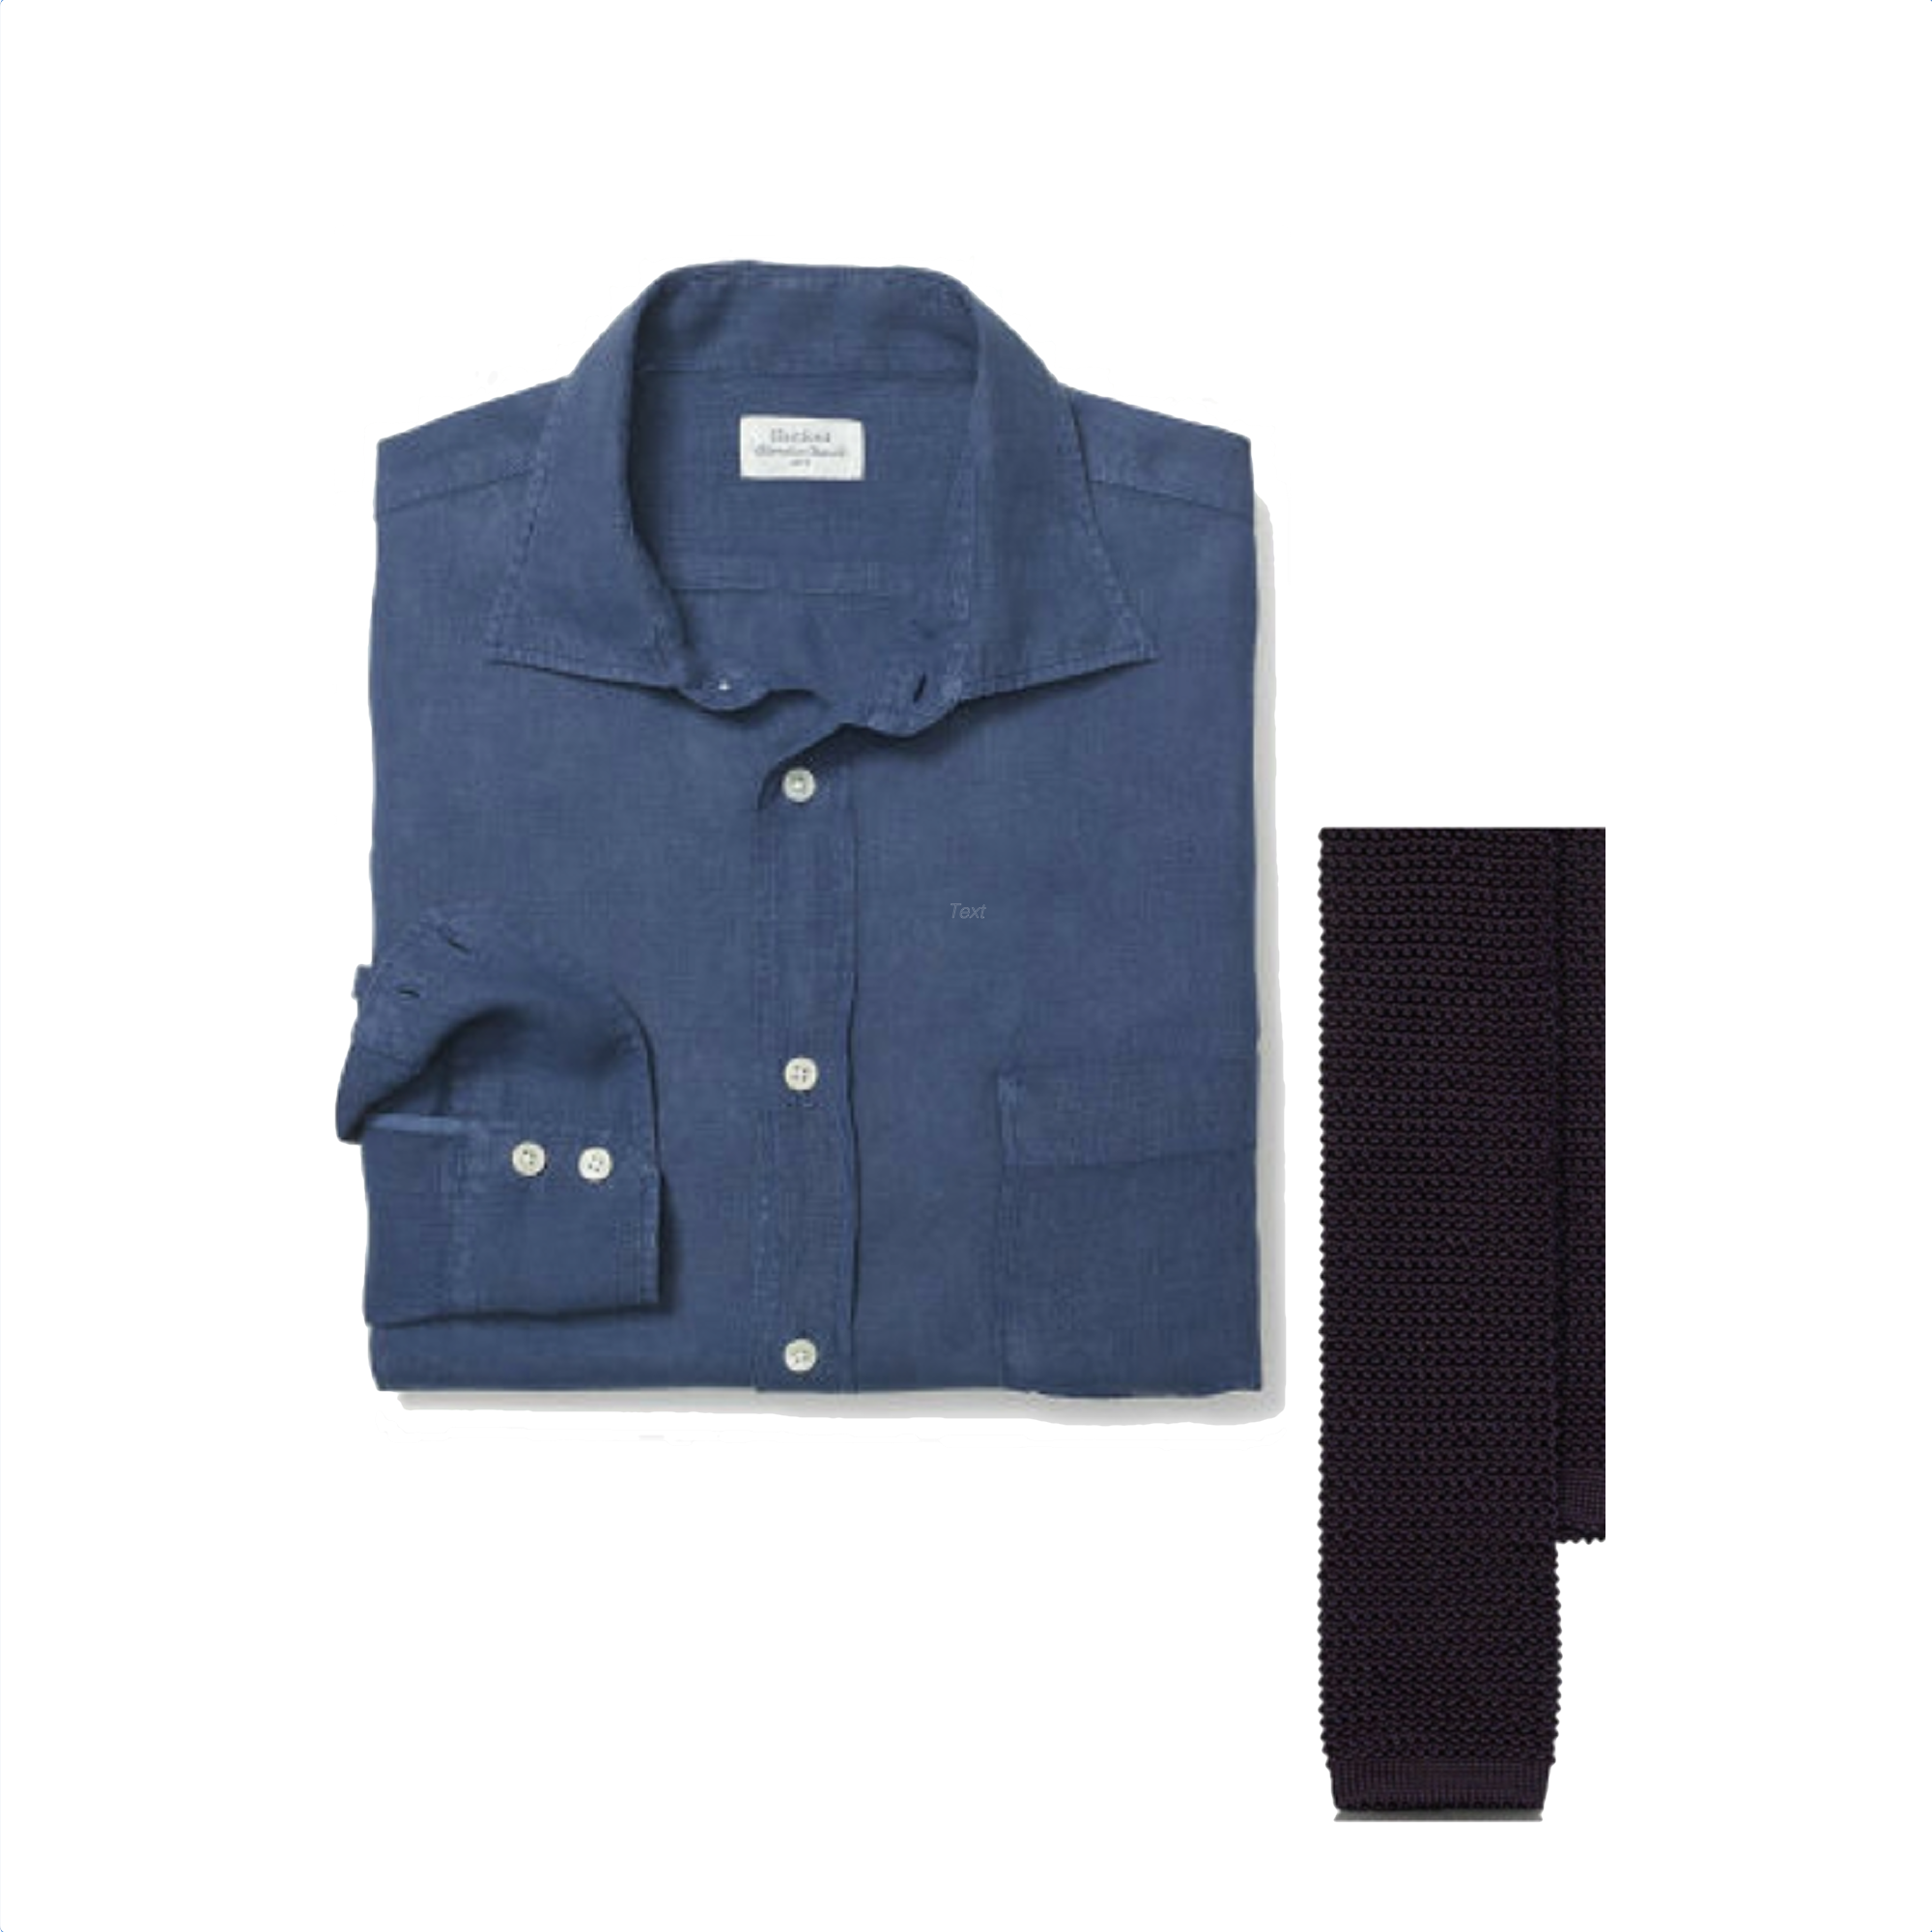 Club Monaco Shirt & Ralph Knit Tie